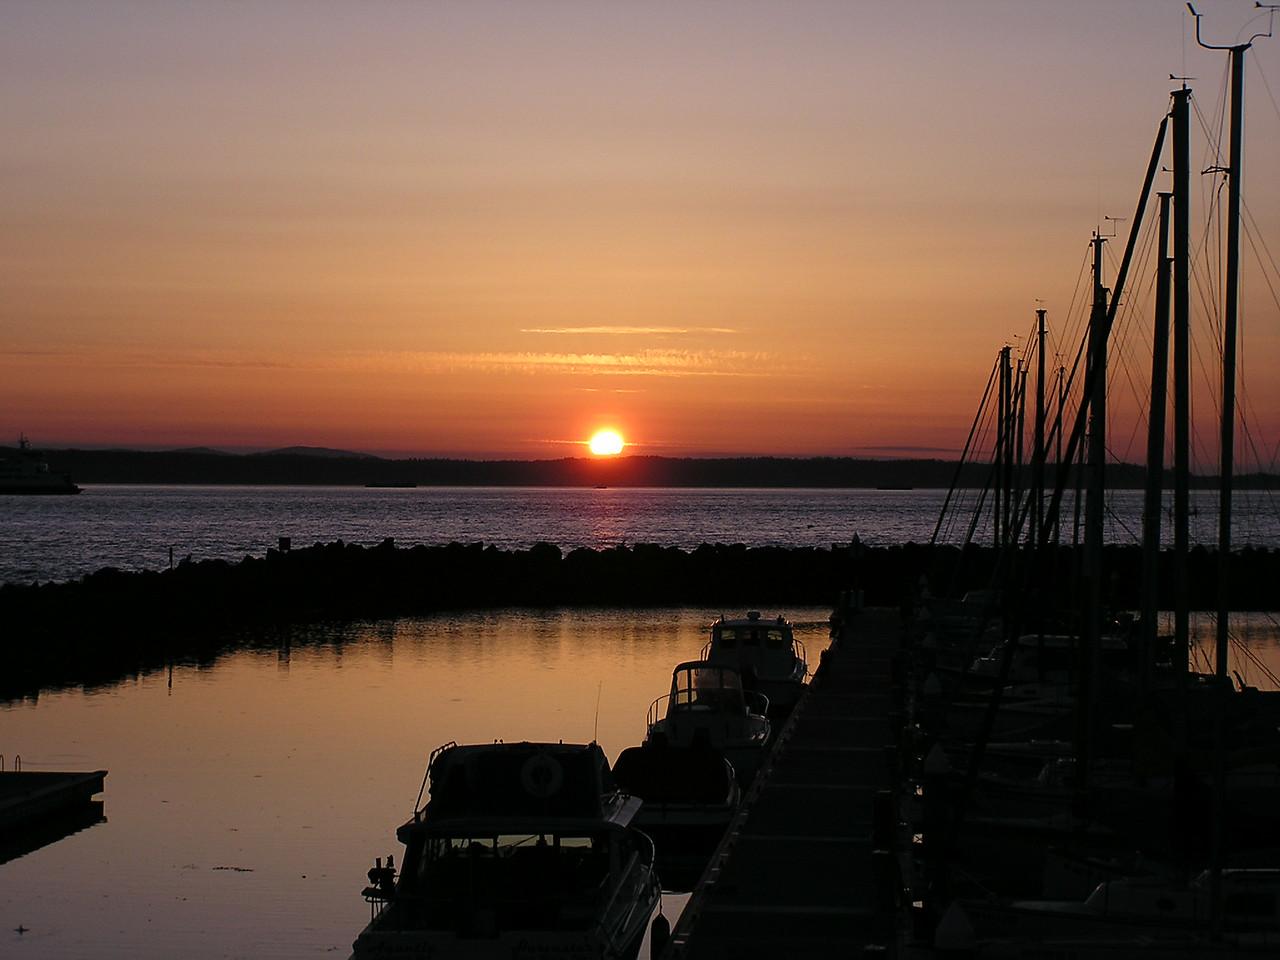 07 06 20 Sunset 004